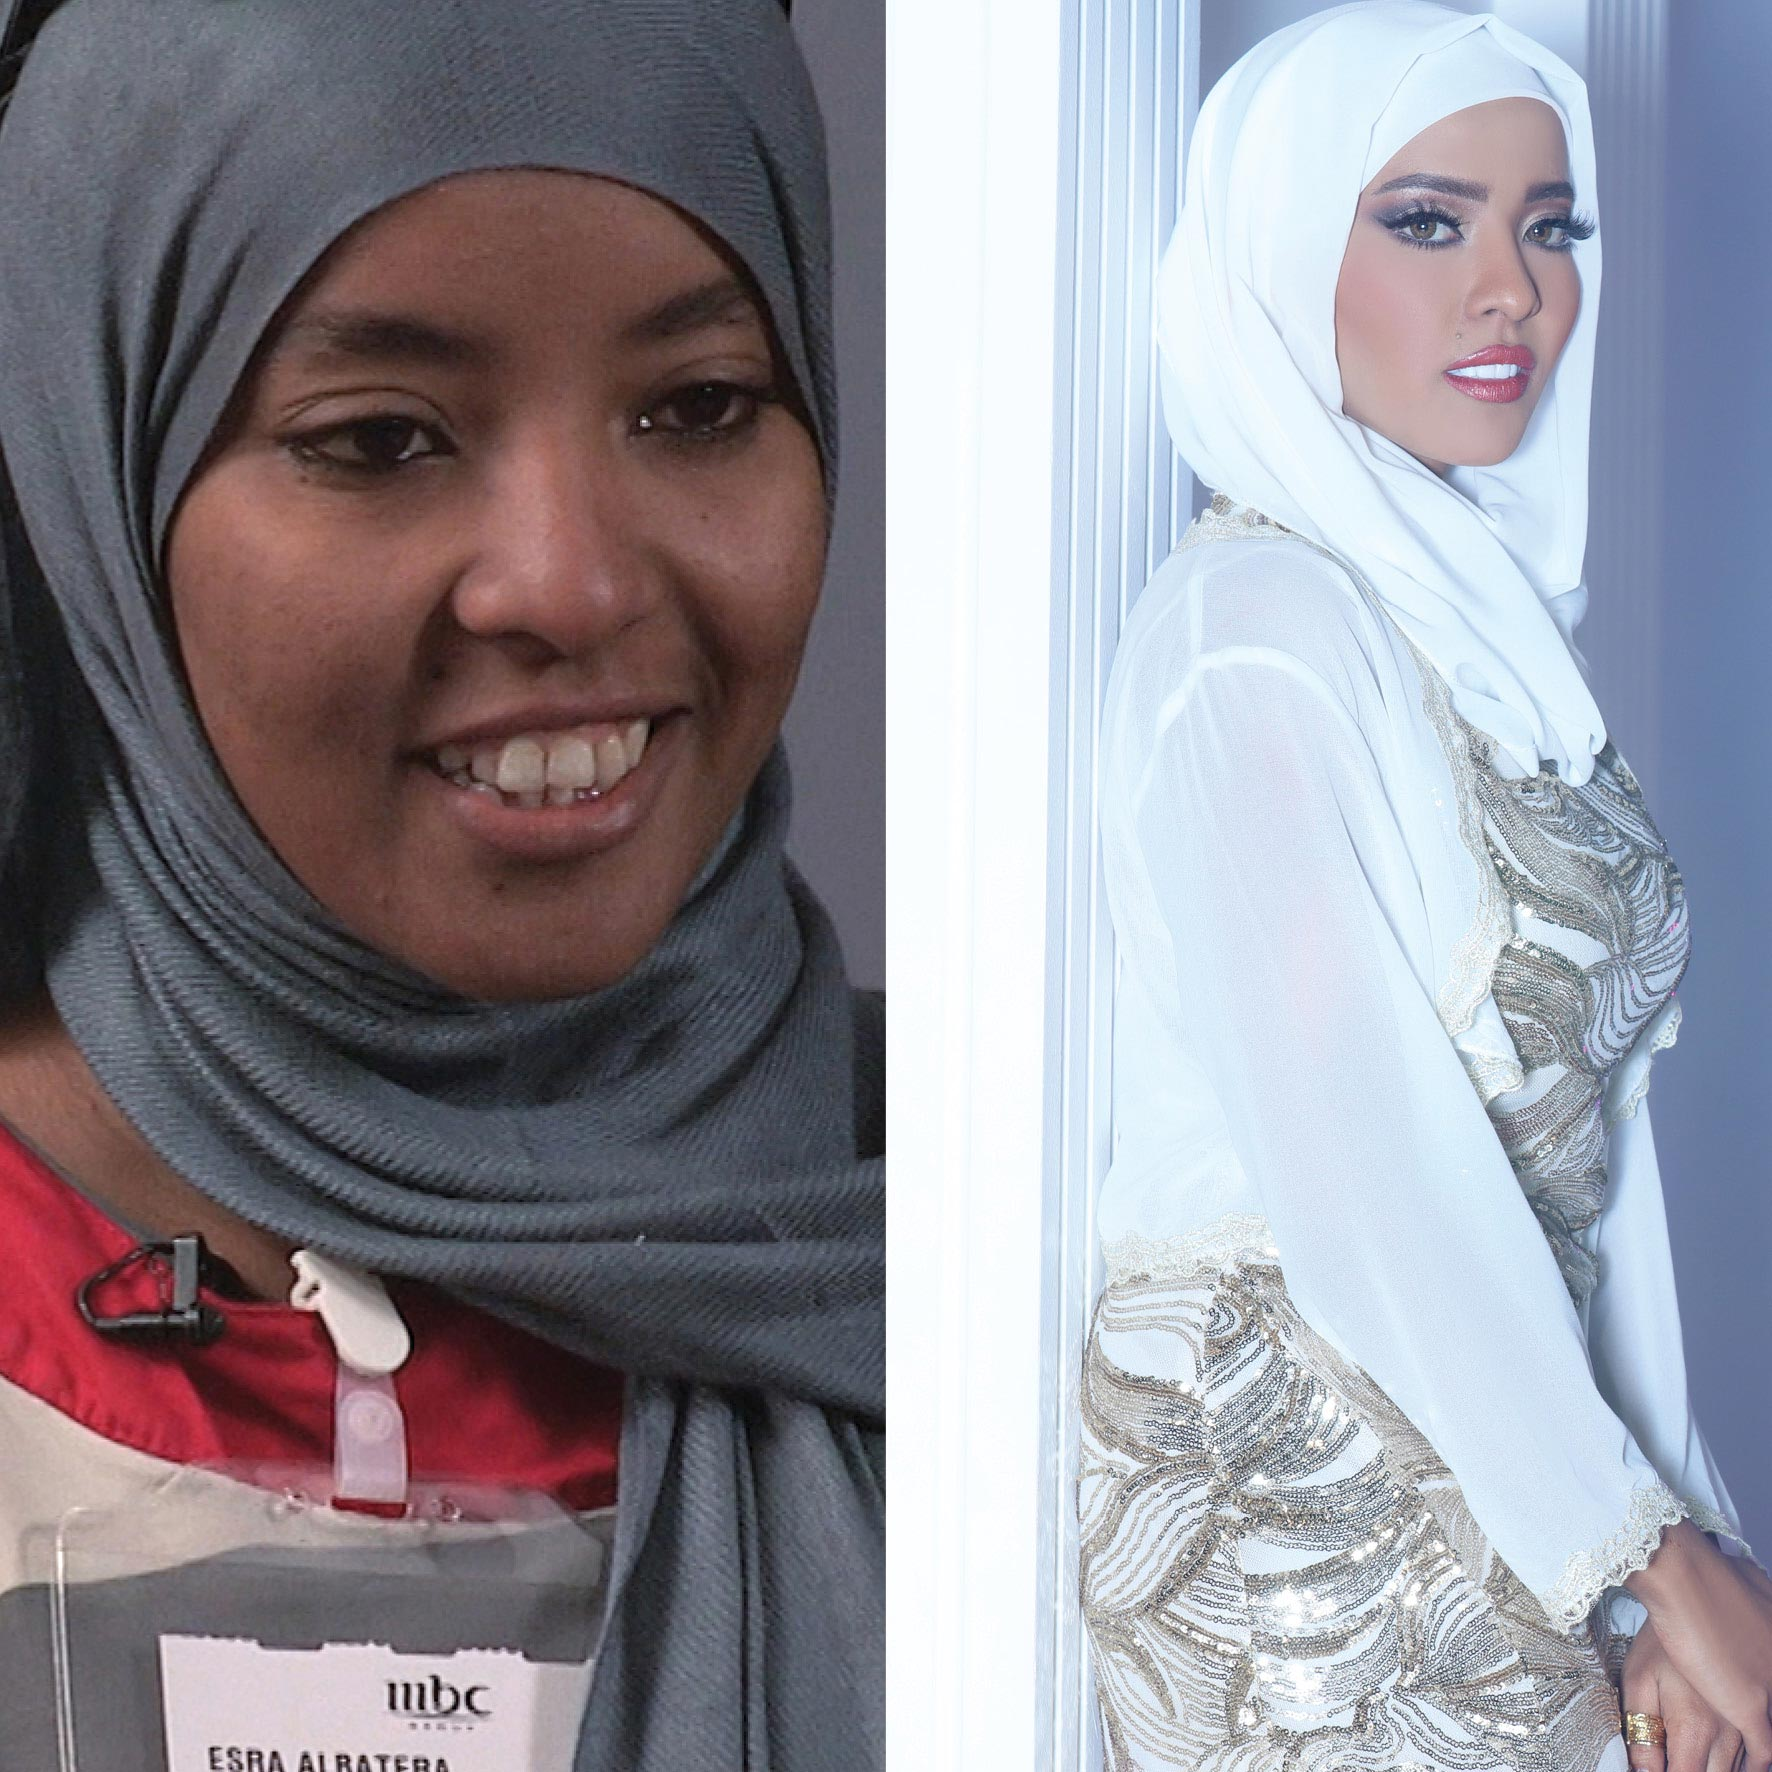 Before&After_CJ_Israa01.jpg